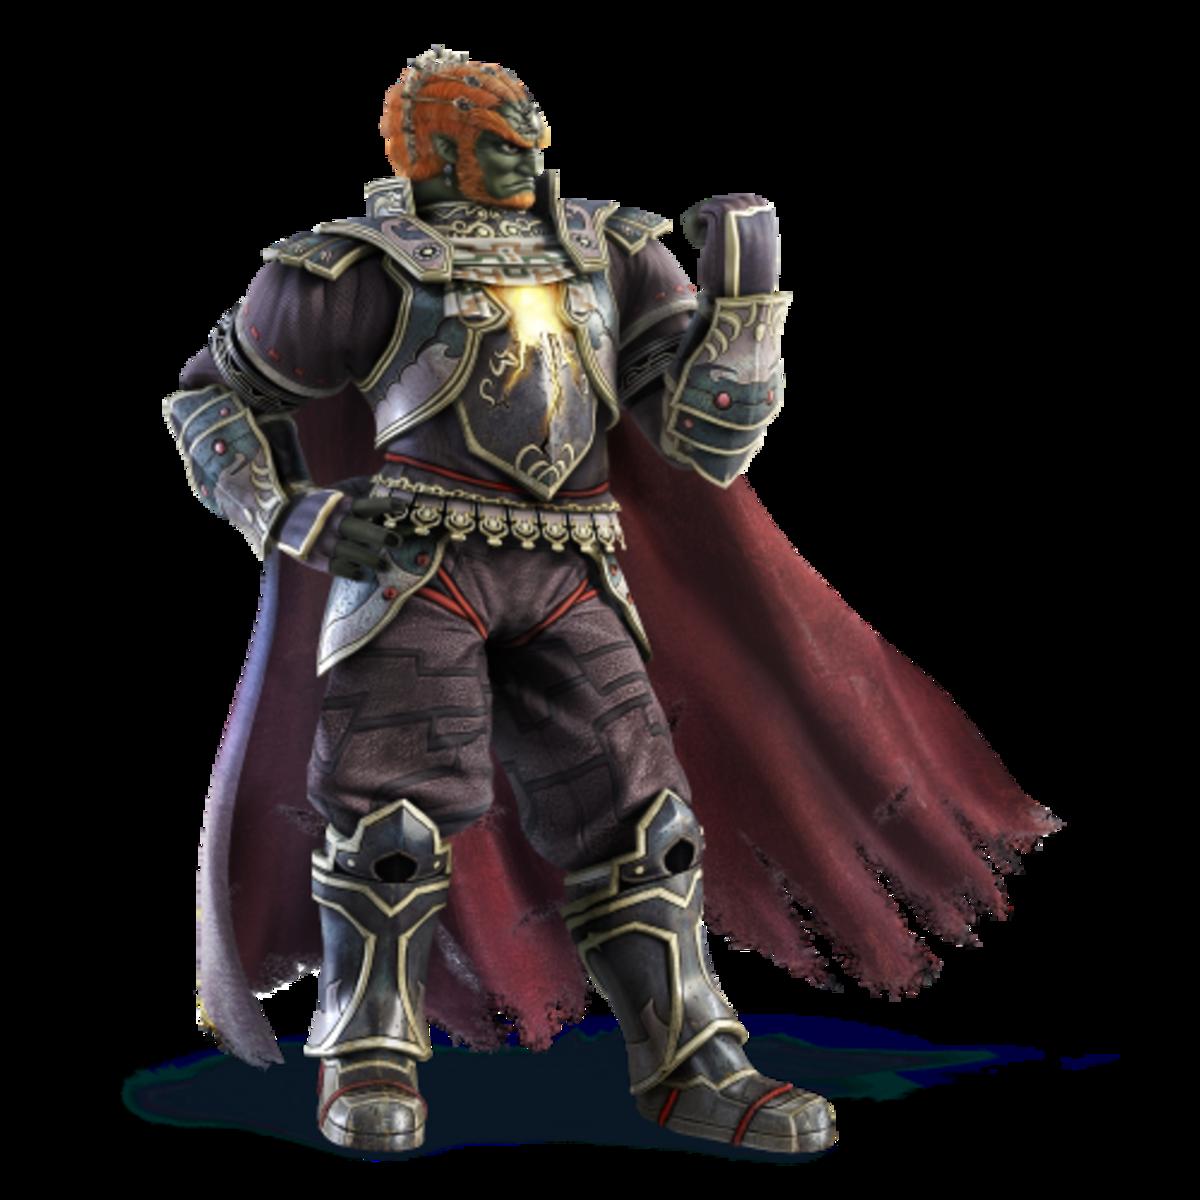 Dark Lord of the Gerudo